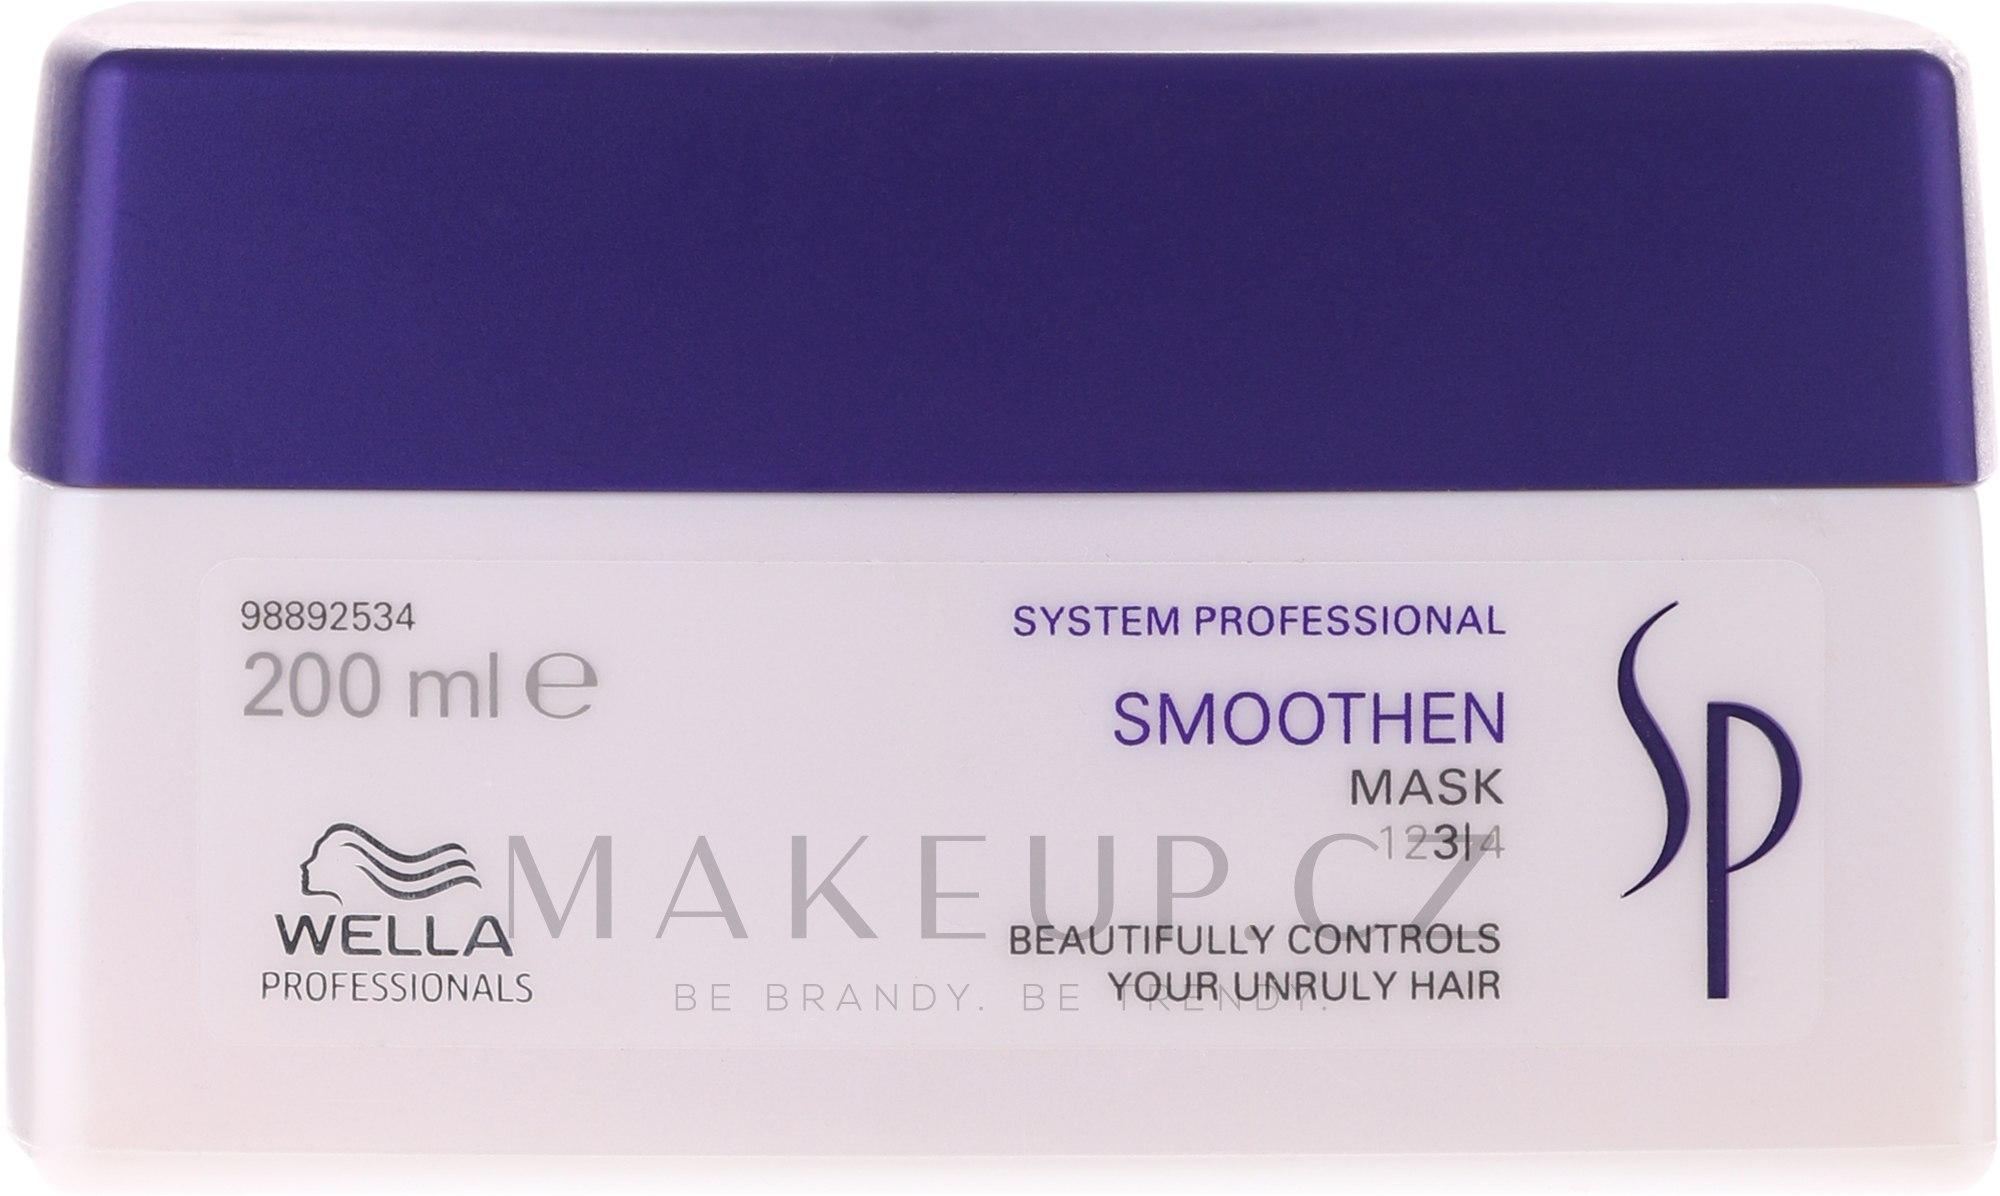 Maska pro hladkost vlasů - Wella SP Smoothen Mask — foto 200 ml